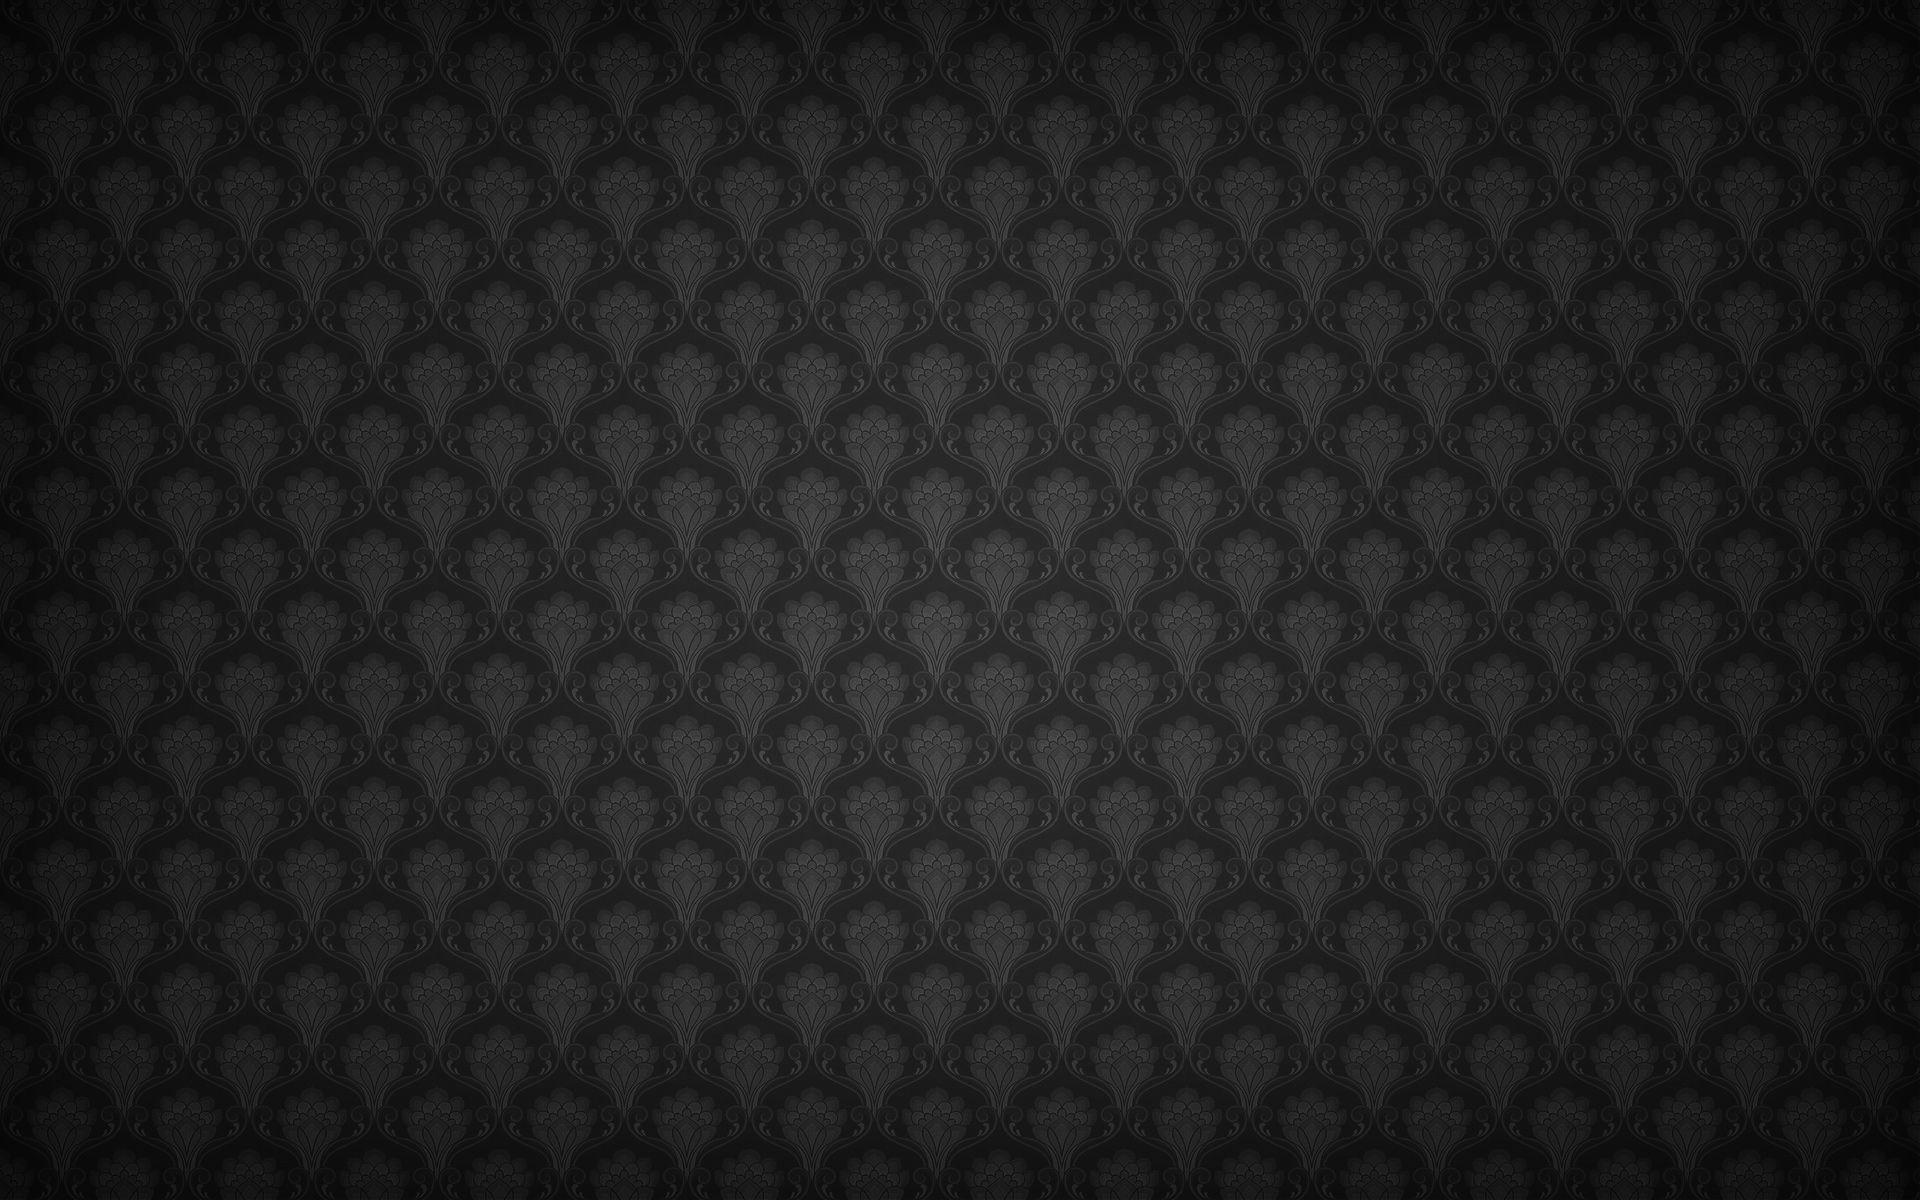 Royal Background ·① Download Free Cool High Resolution Backgrounds For Desktop, Mobile, Laptop